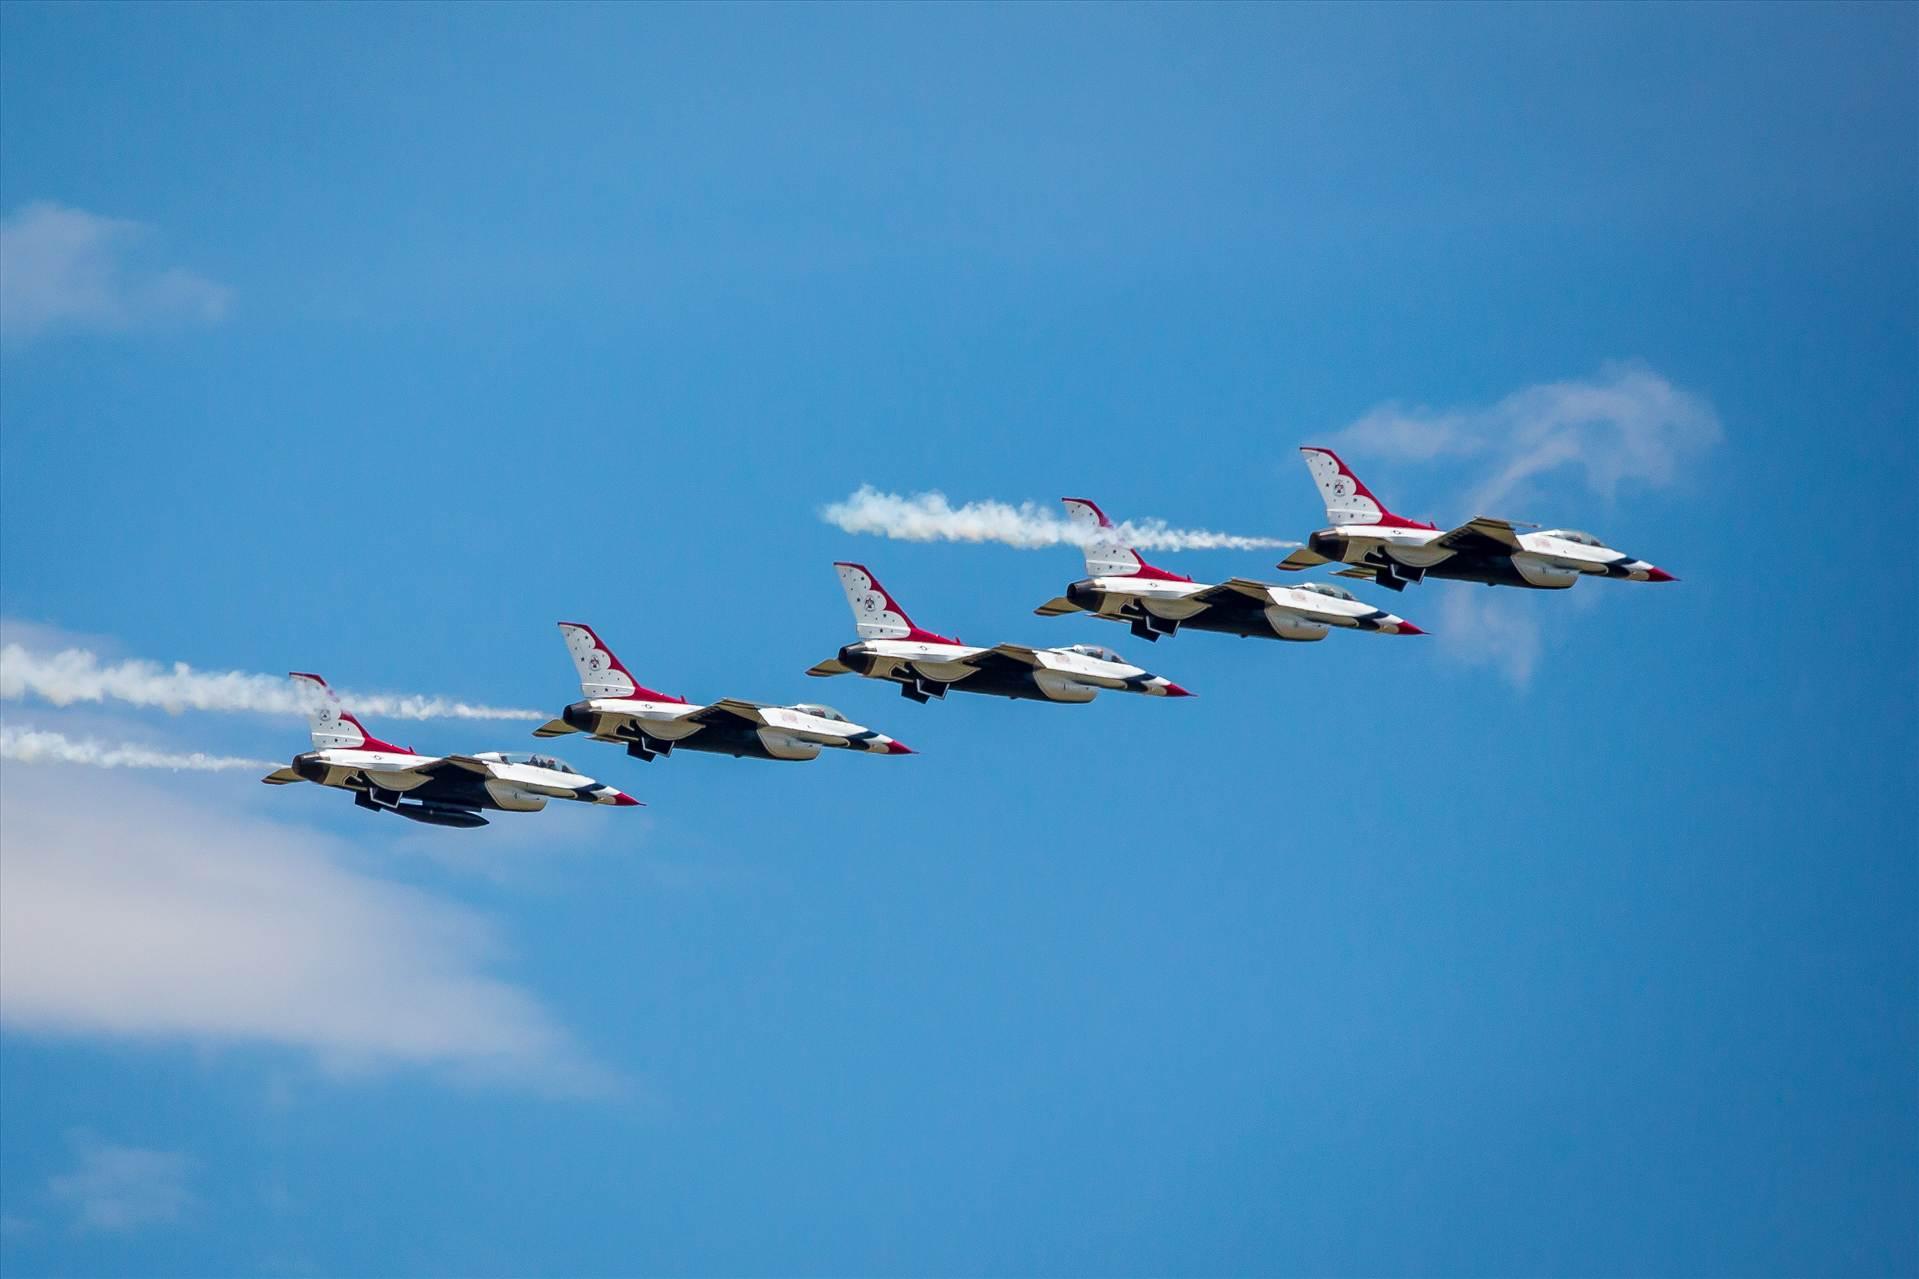 USAF Thunderbirds 7 -  by D Scott Smith